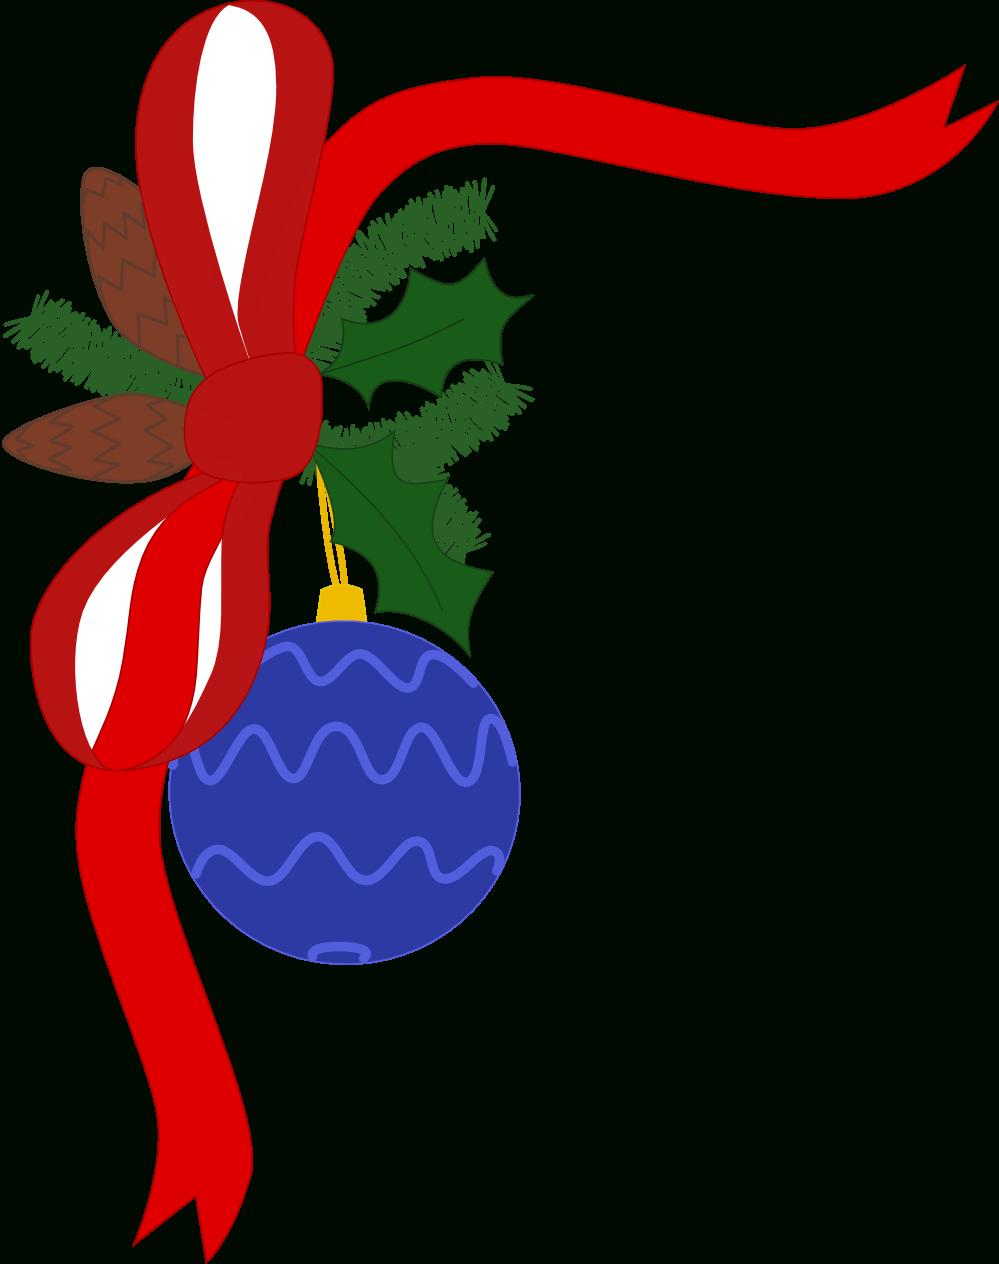 Holidays clipart clip art. Free holiday sanjonmotel images